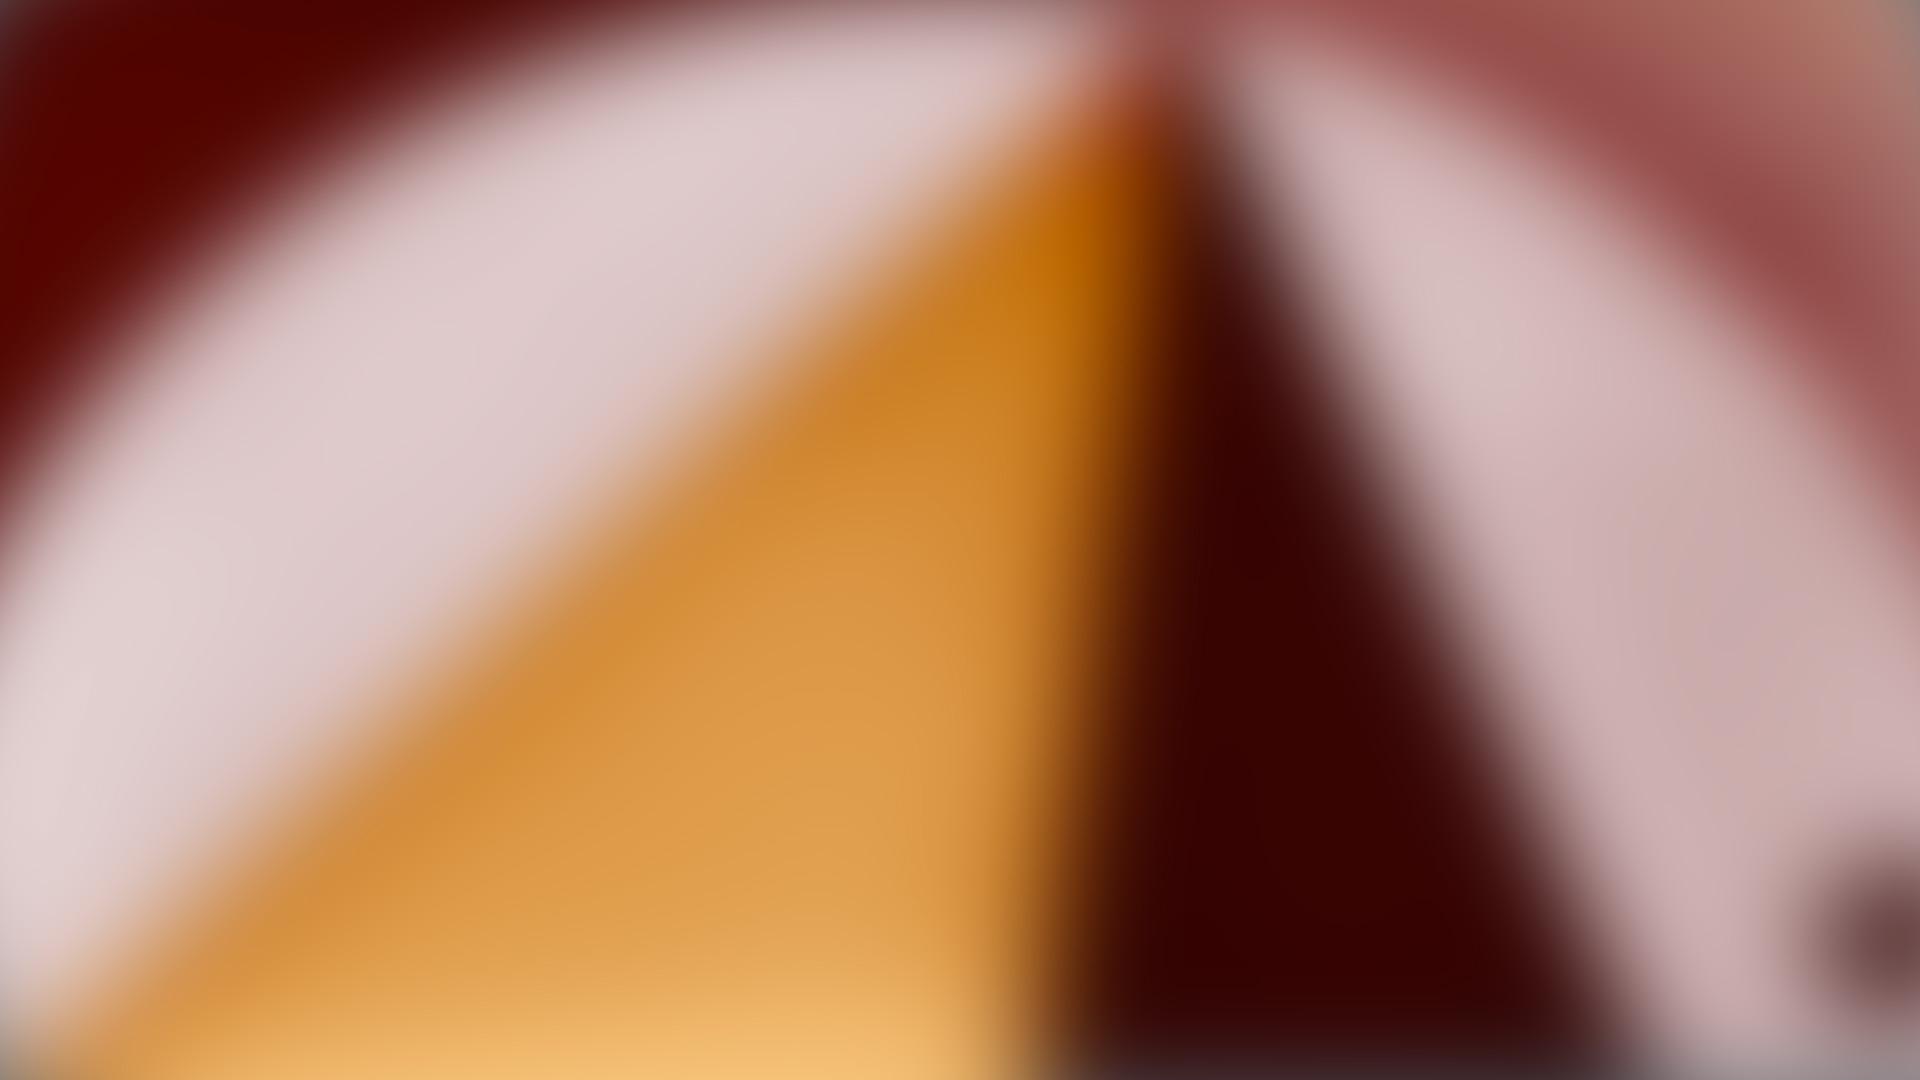 Mobilee211_MEMO_AnotherNight_bg-blur